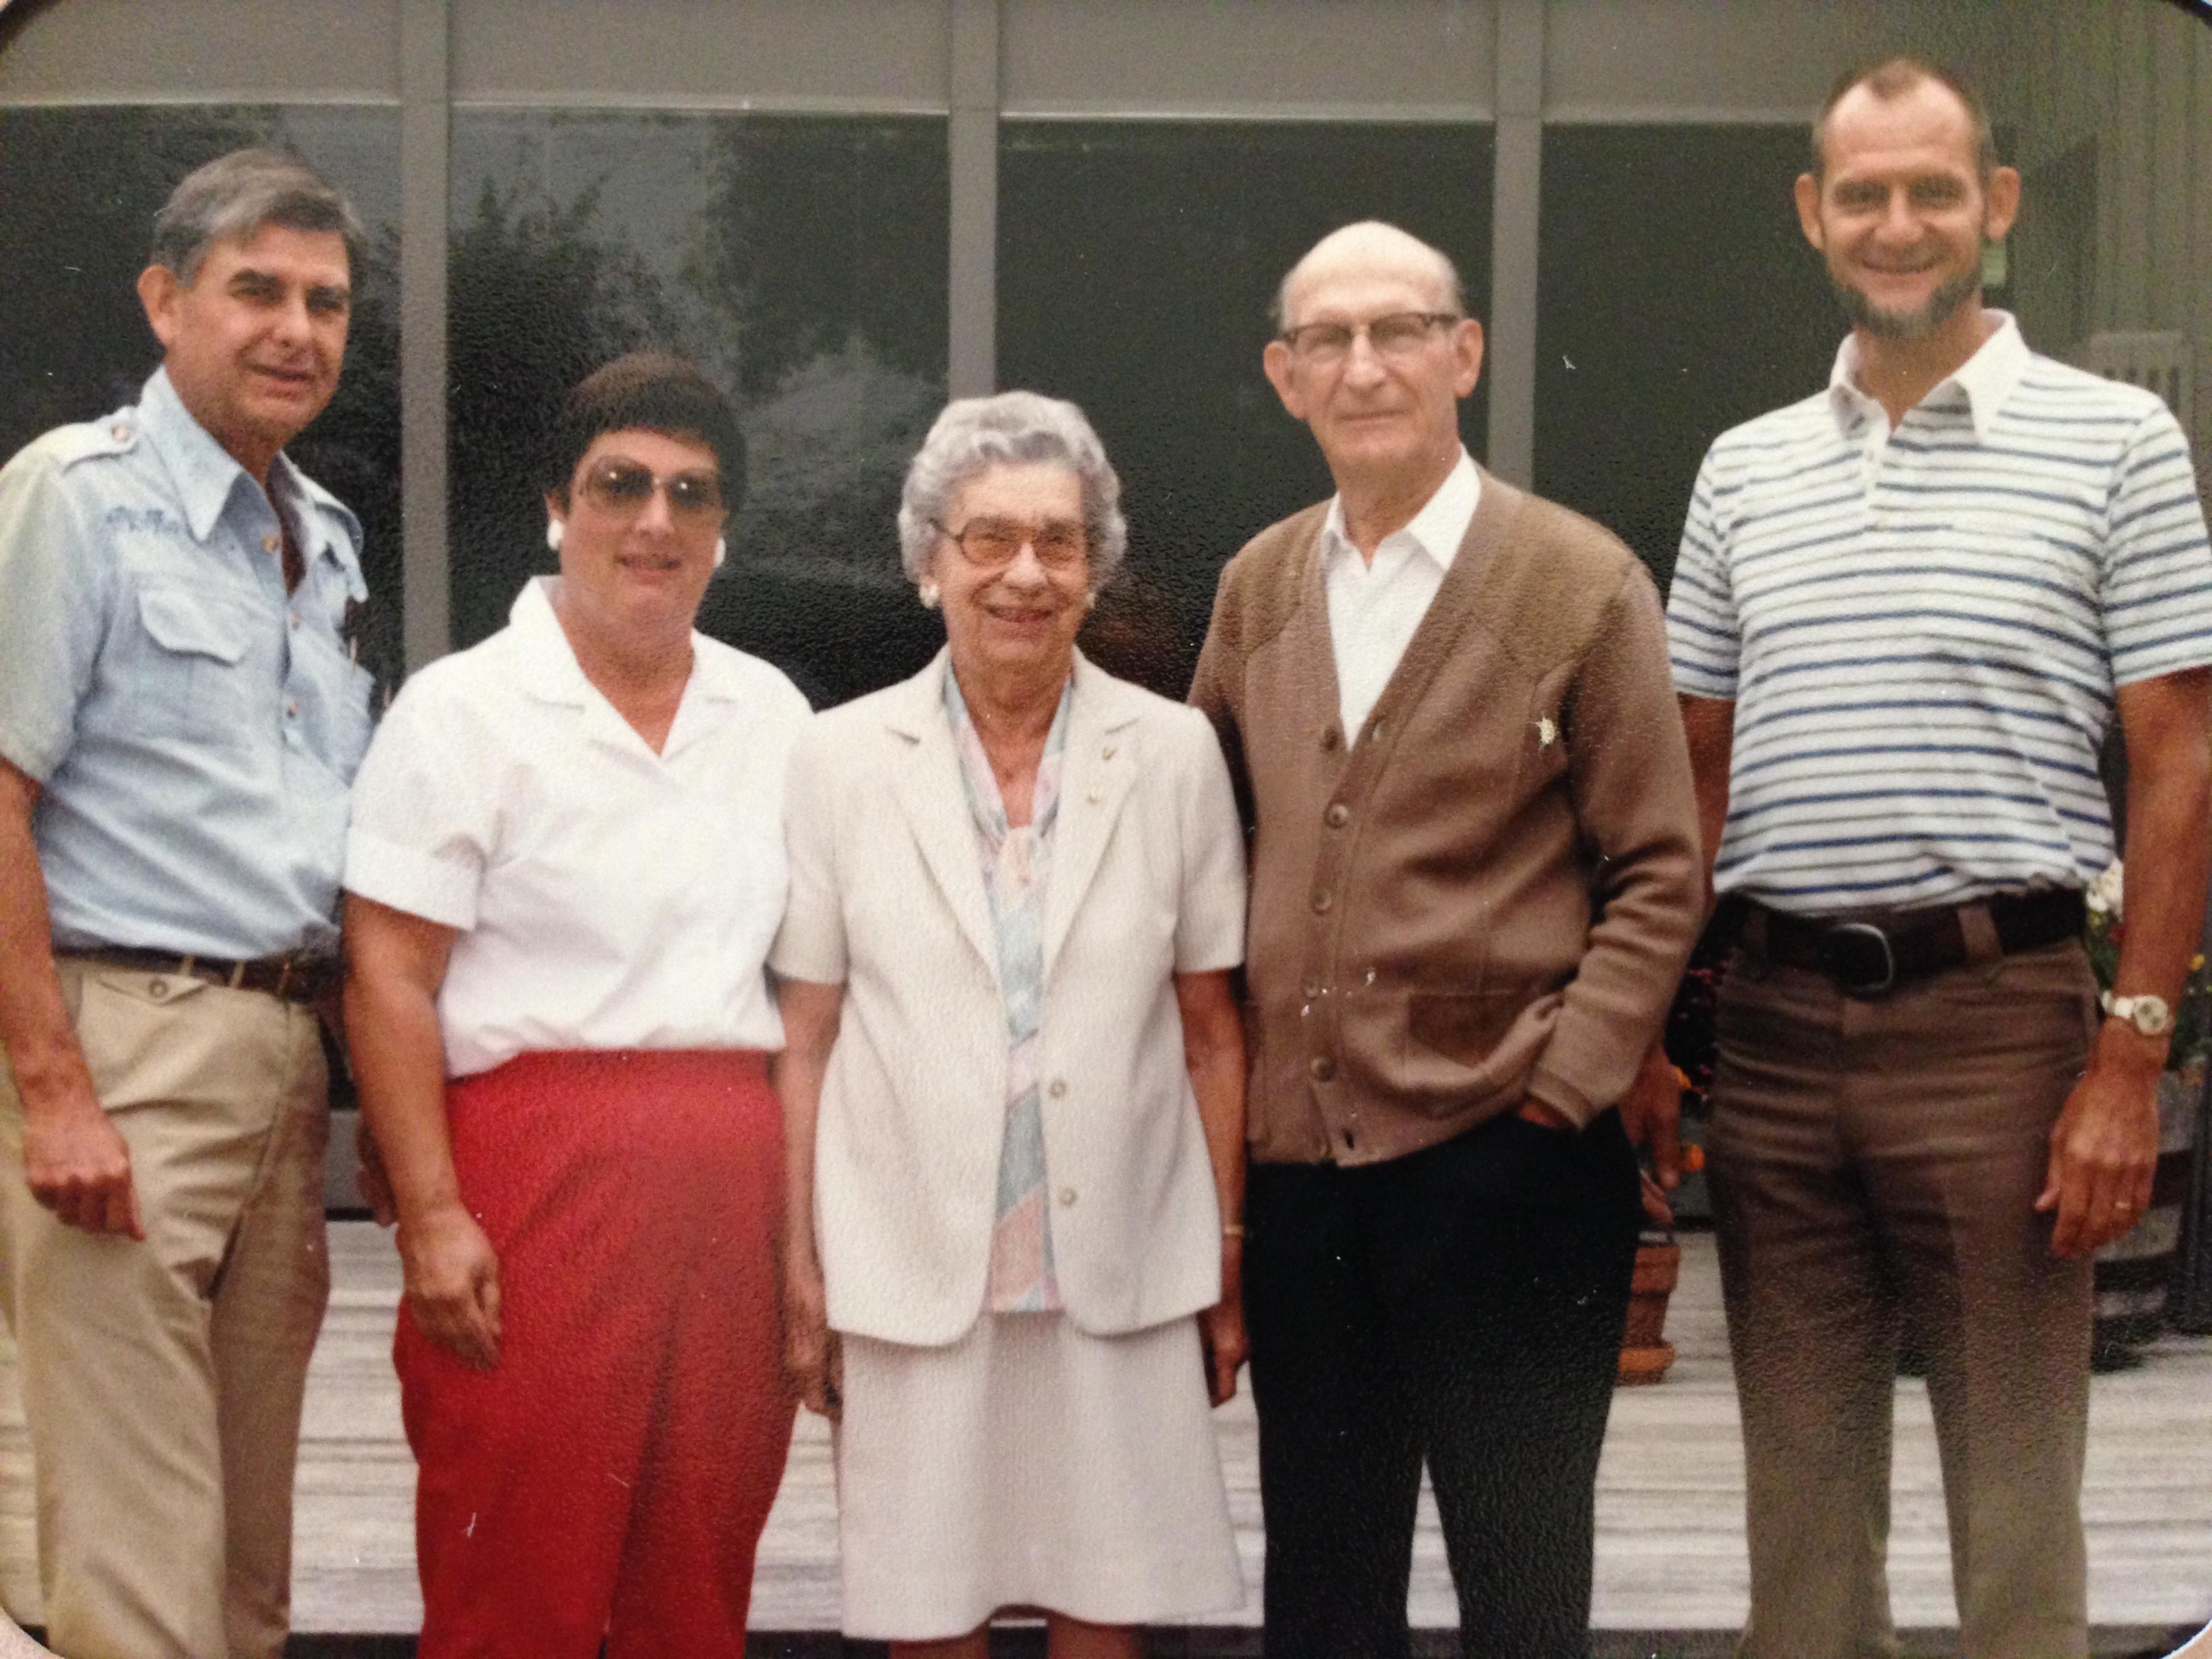 Bob, Norene, Vernice, uncle & cousin